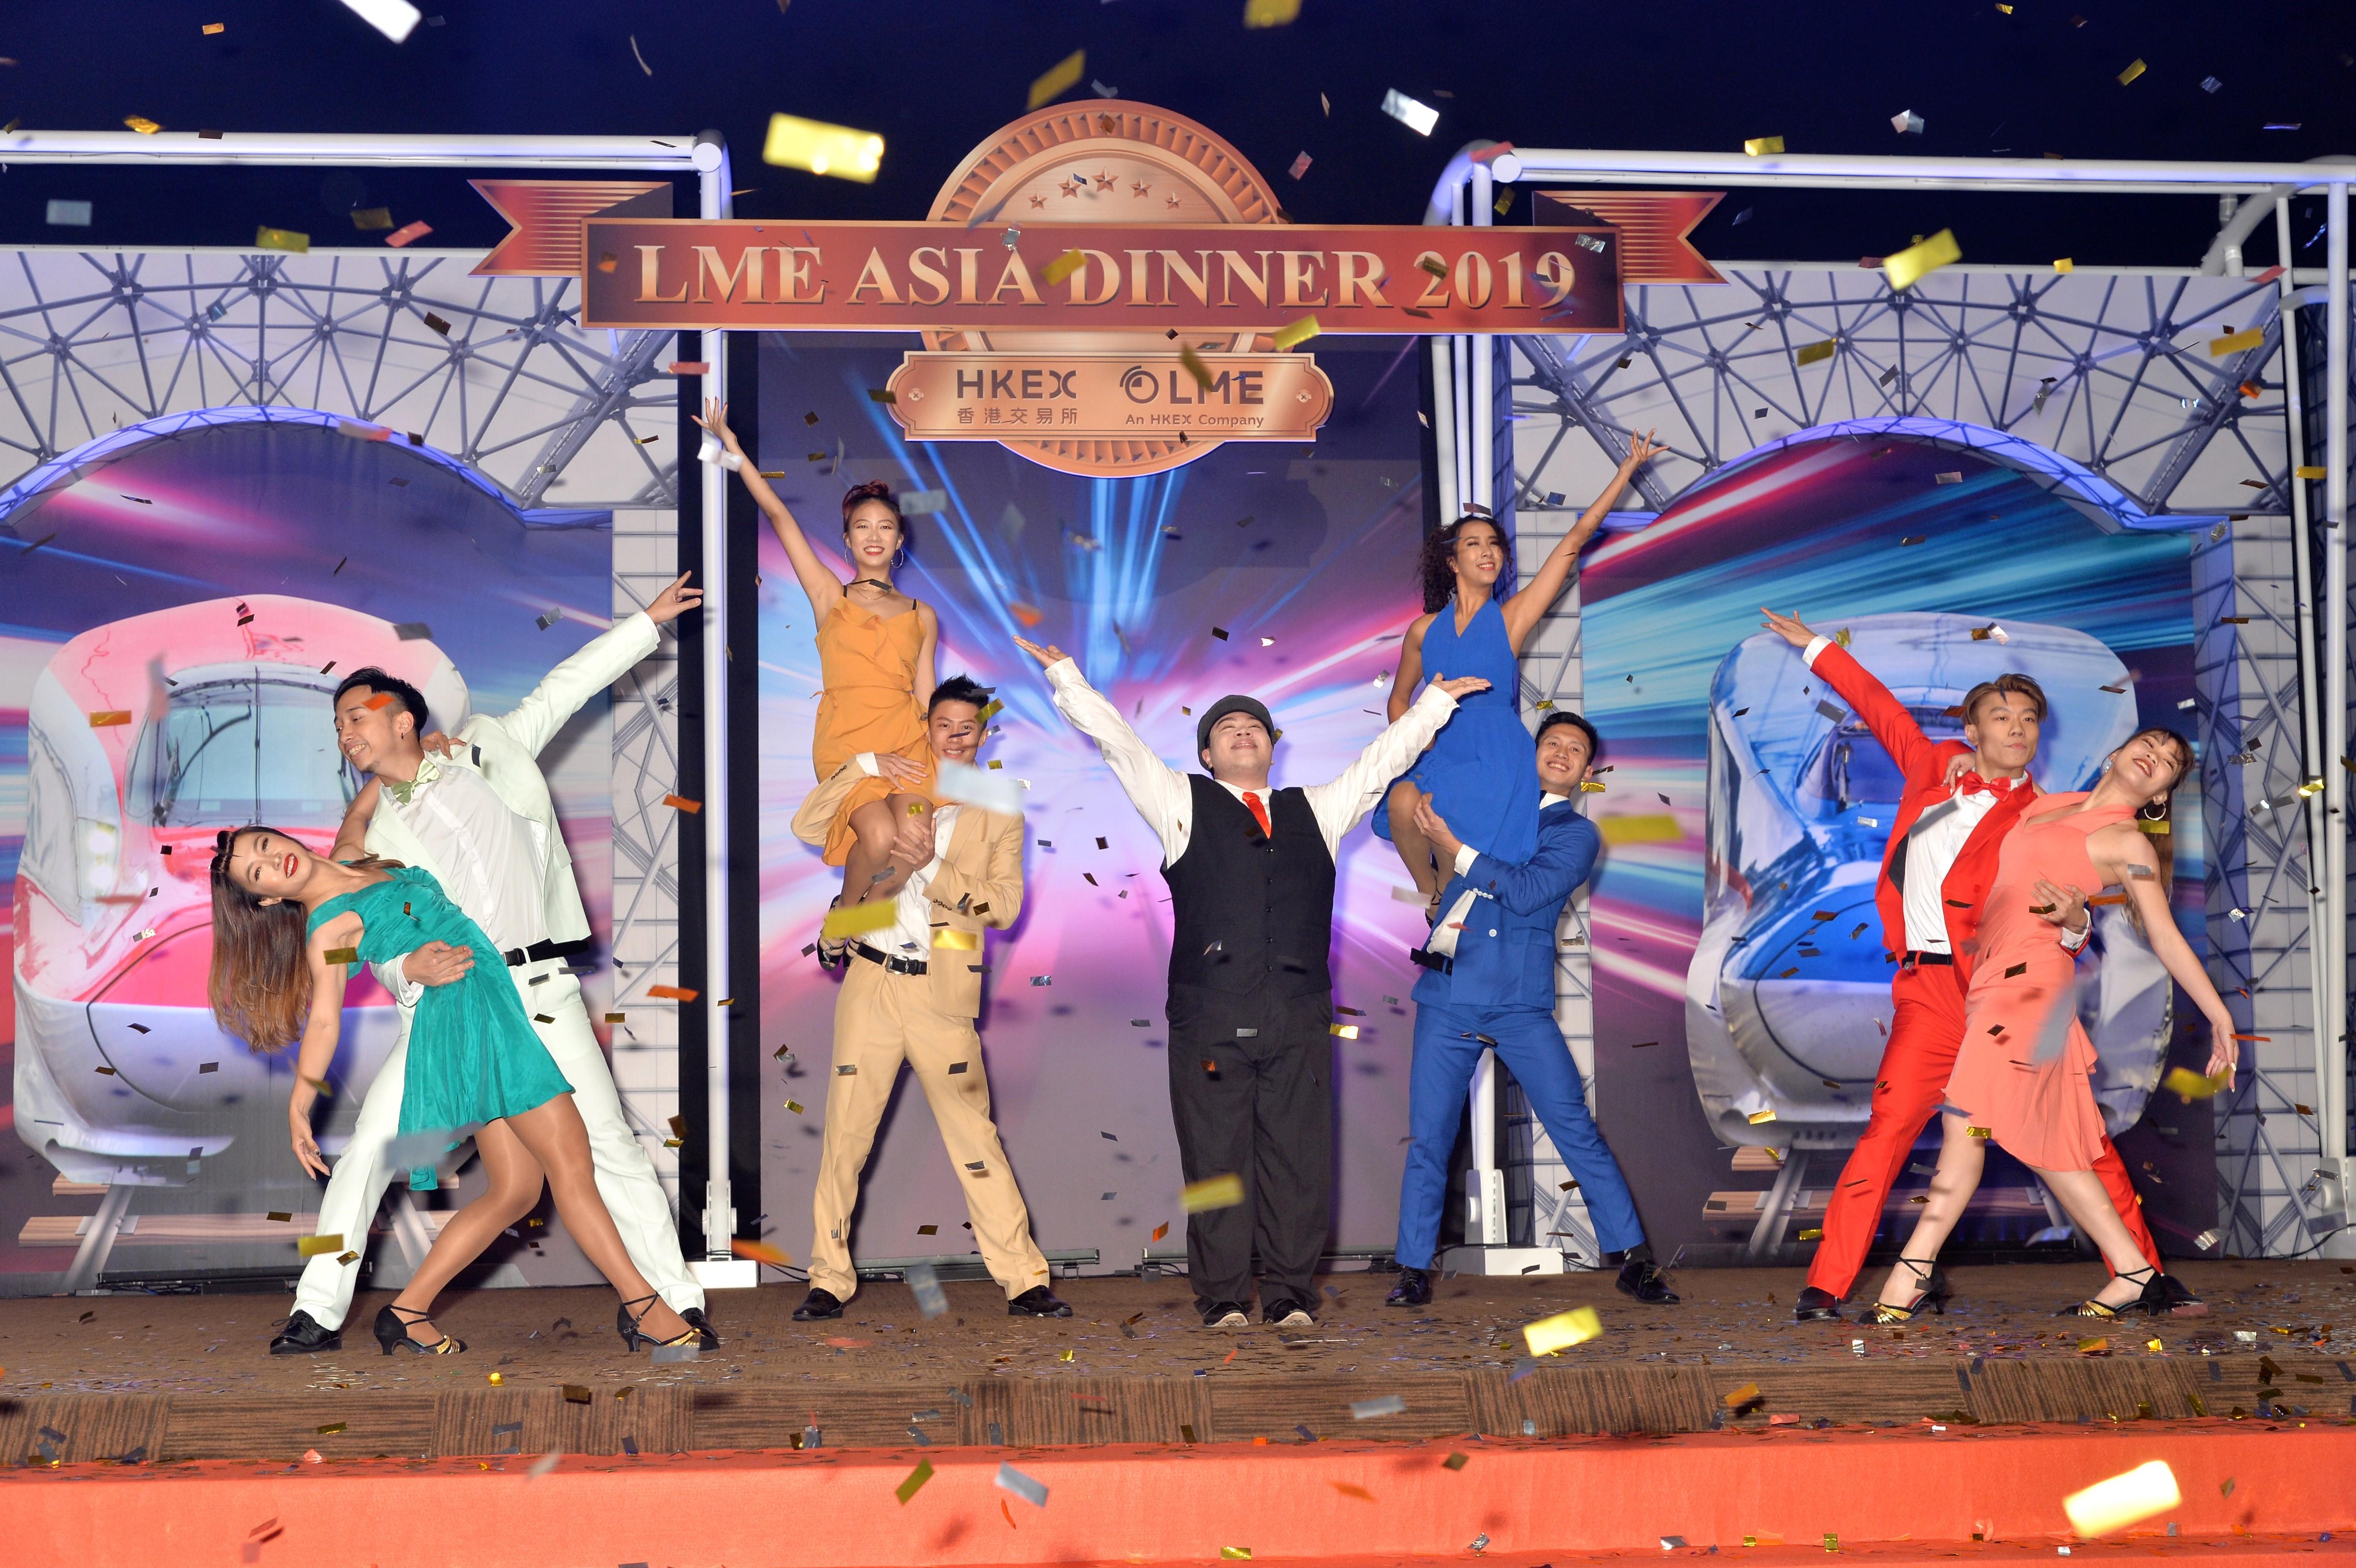 LME Asia Dinner Performance2